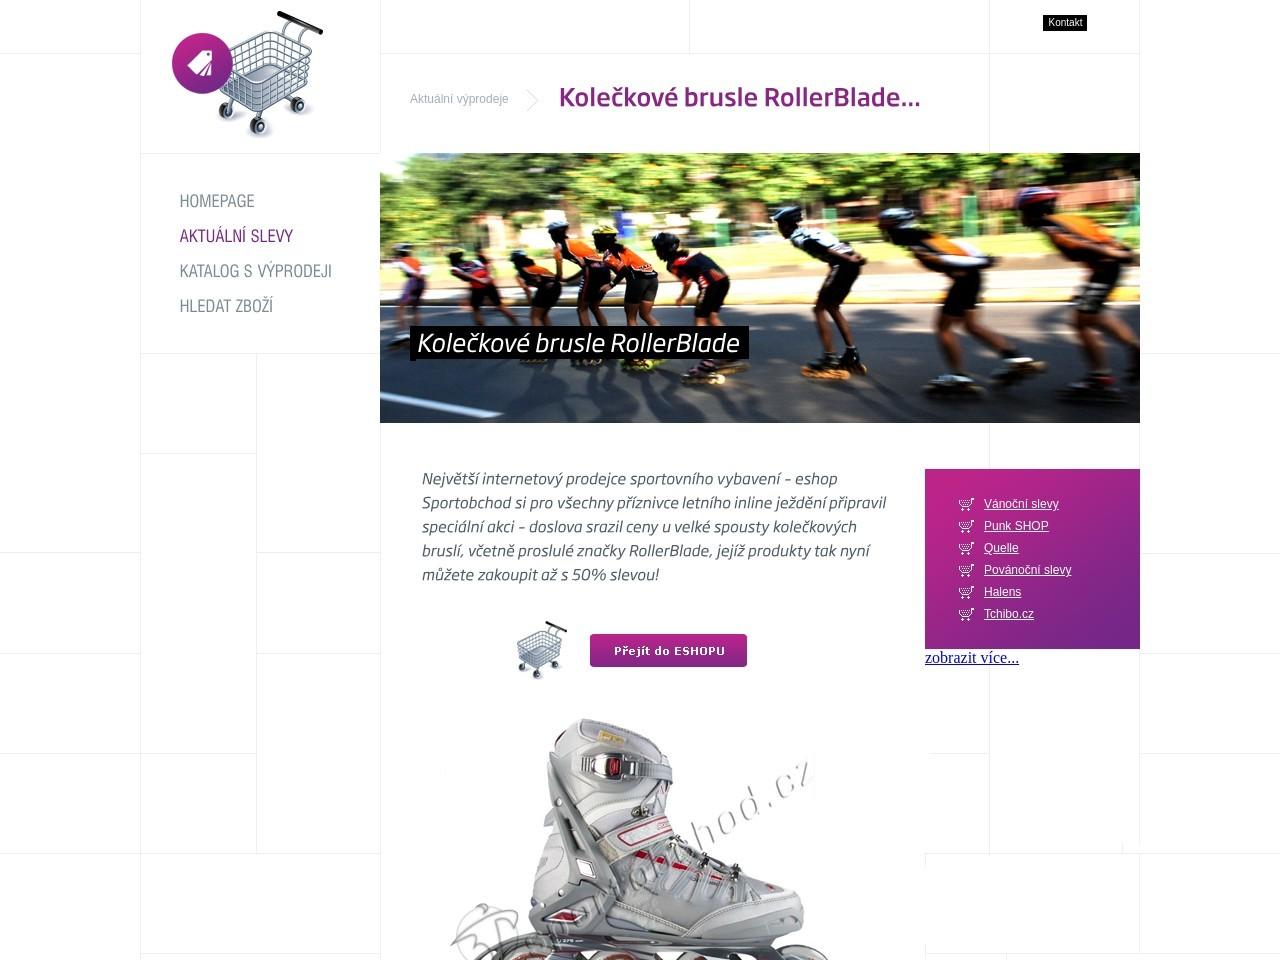 Kolečkové brusle RollerBlade (Zdroj: Wordpress.com)